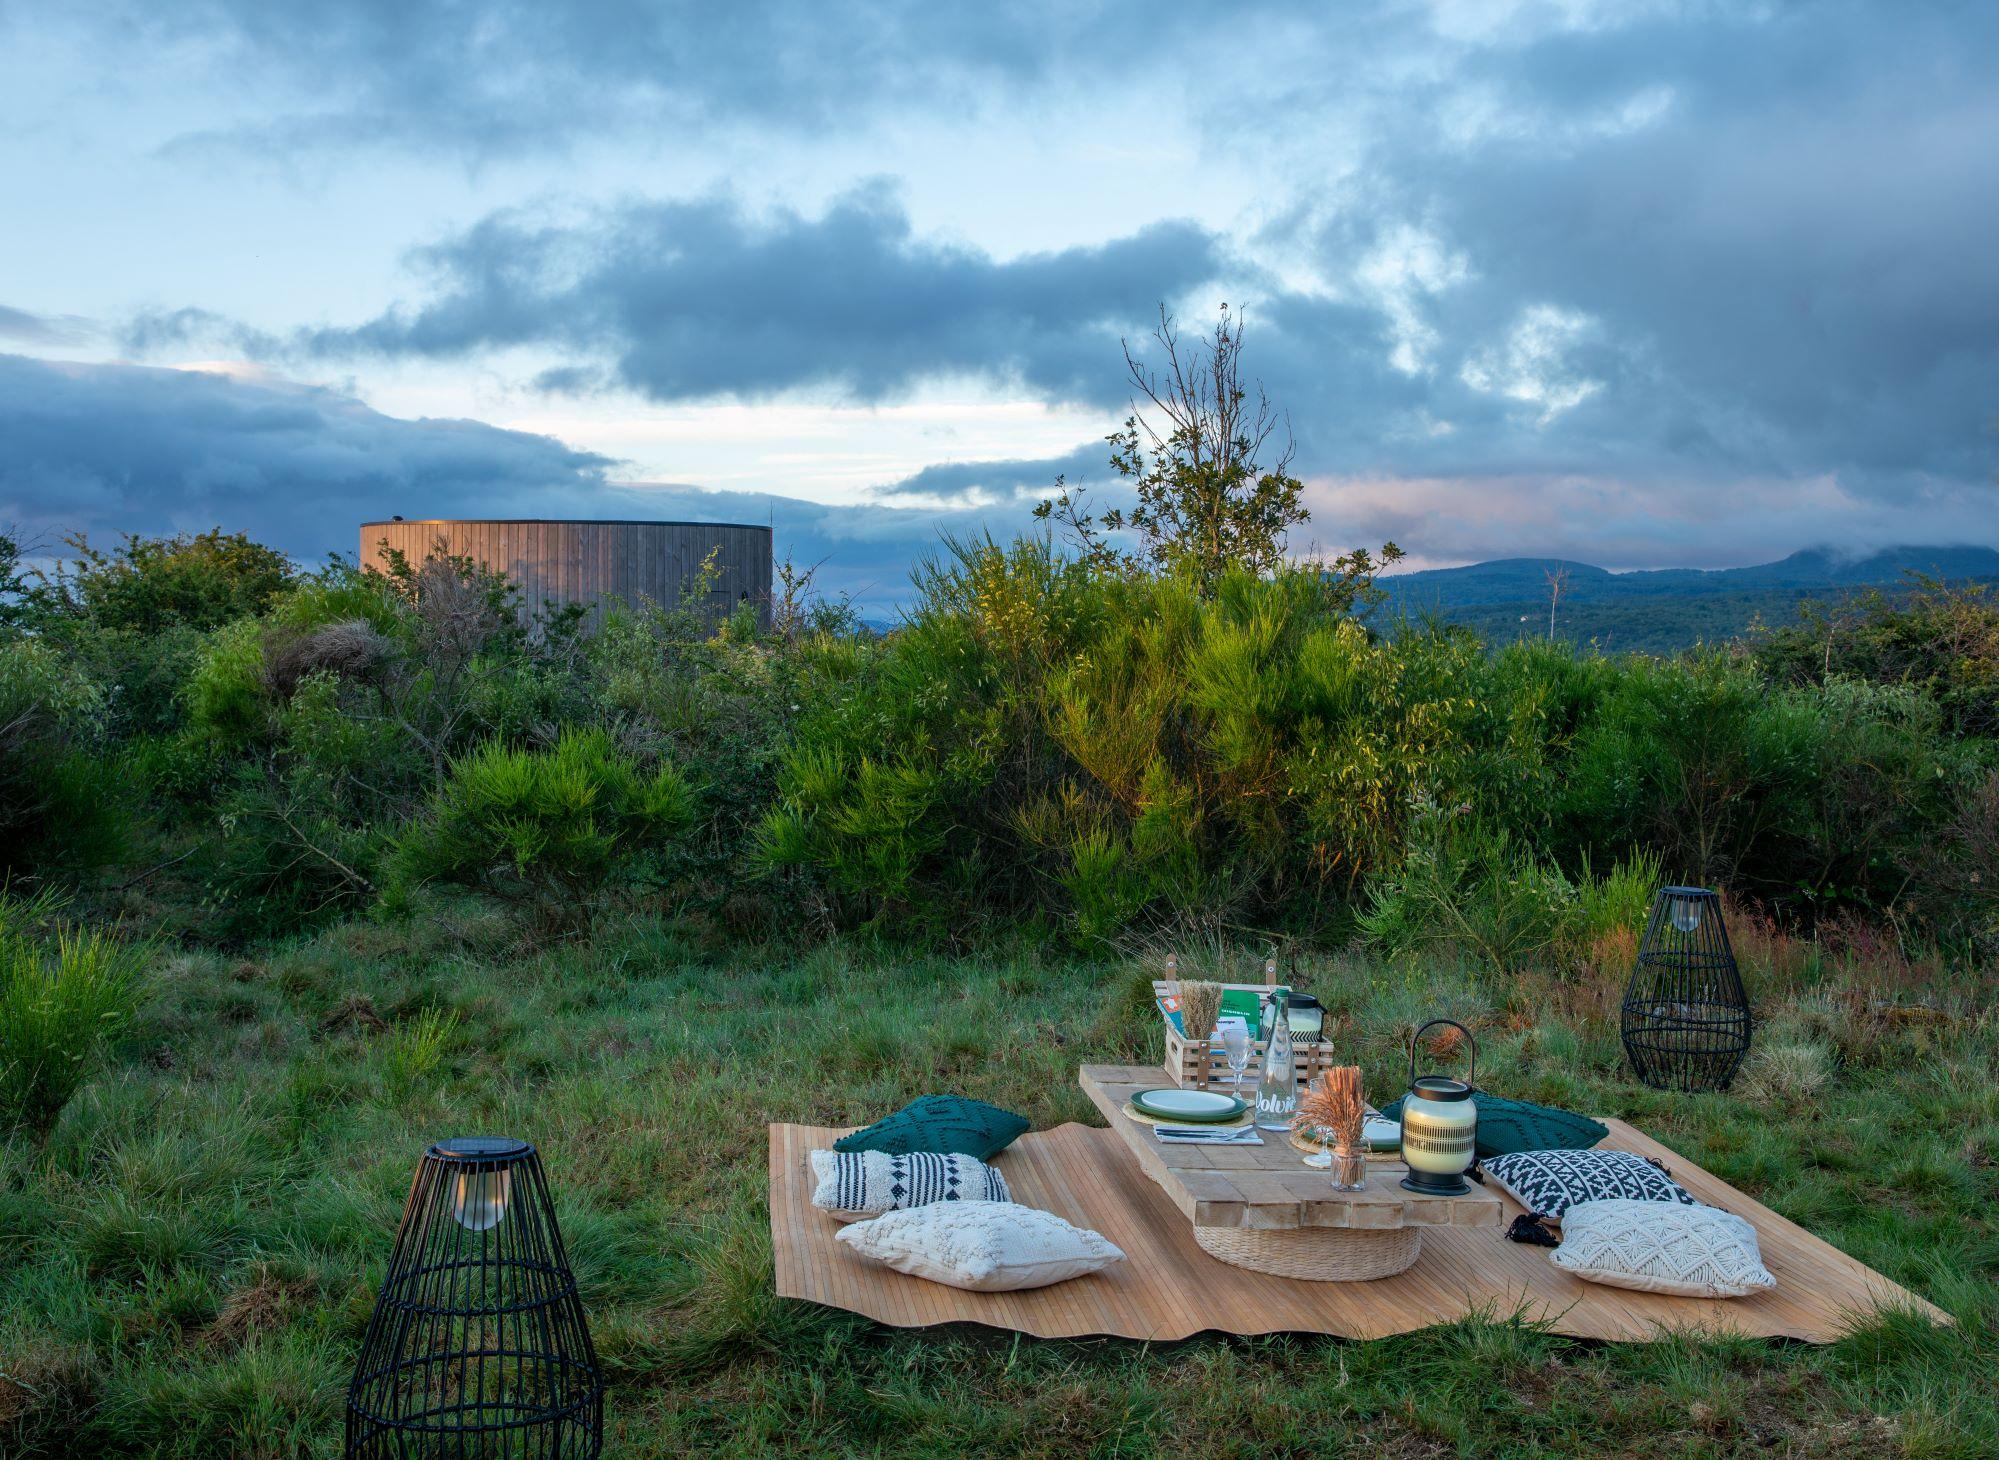 kilian jornet airbnb picnic